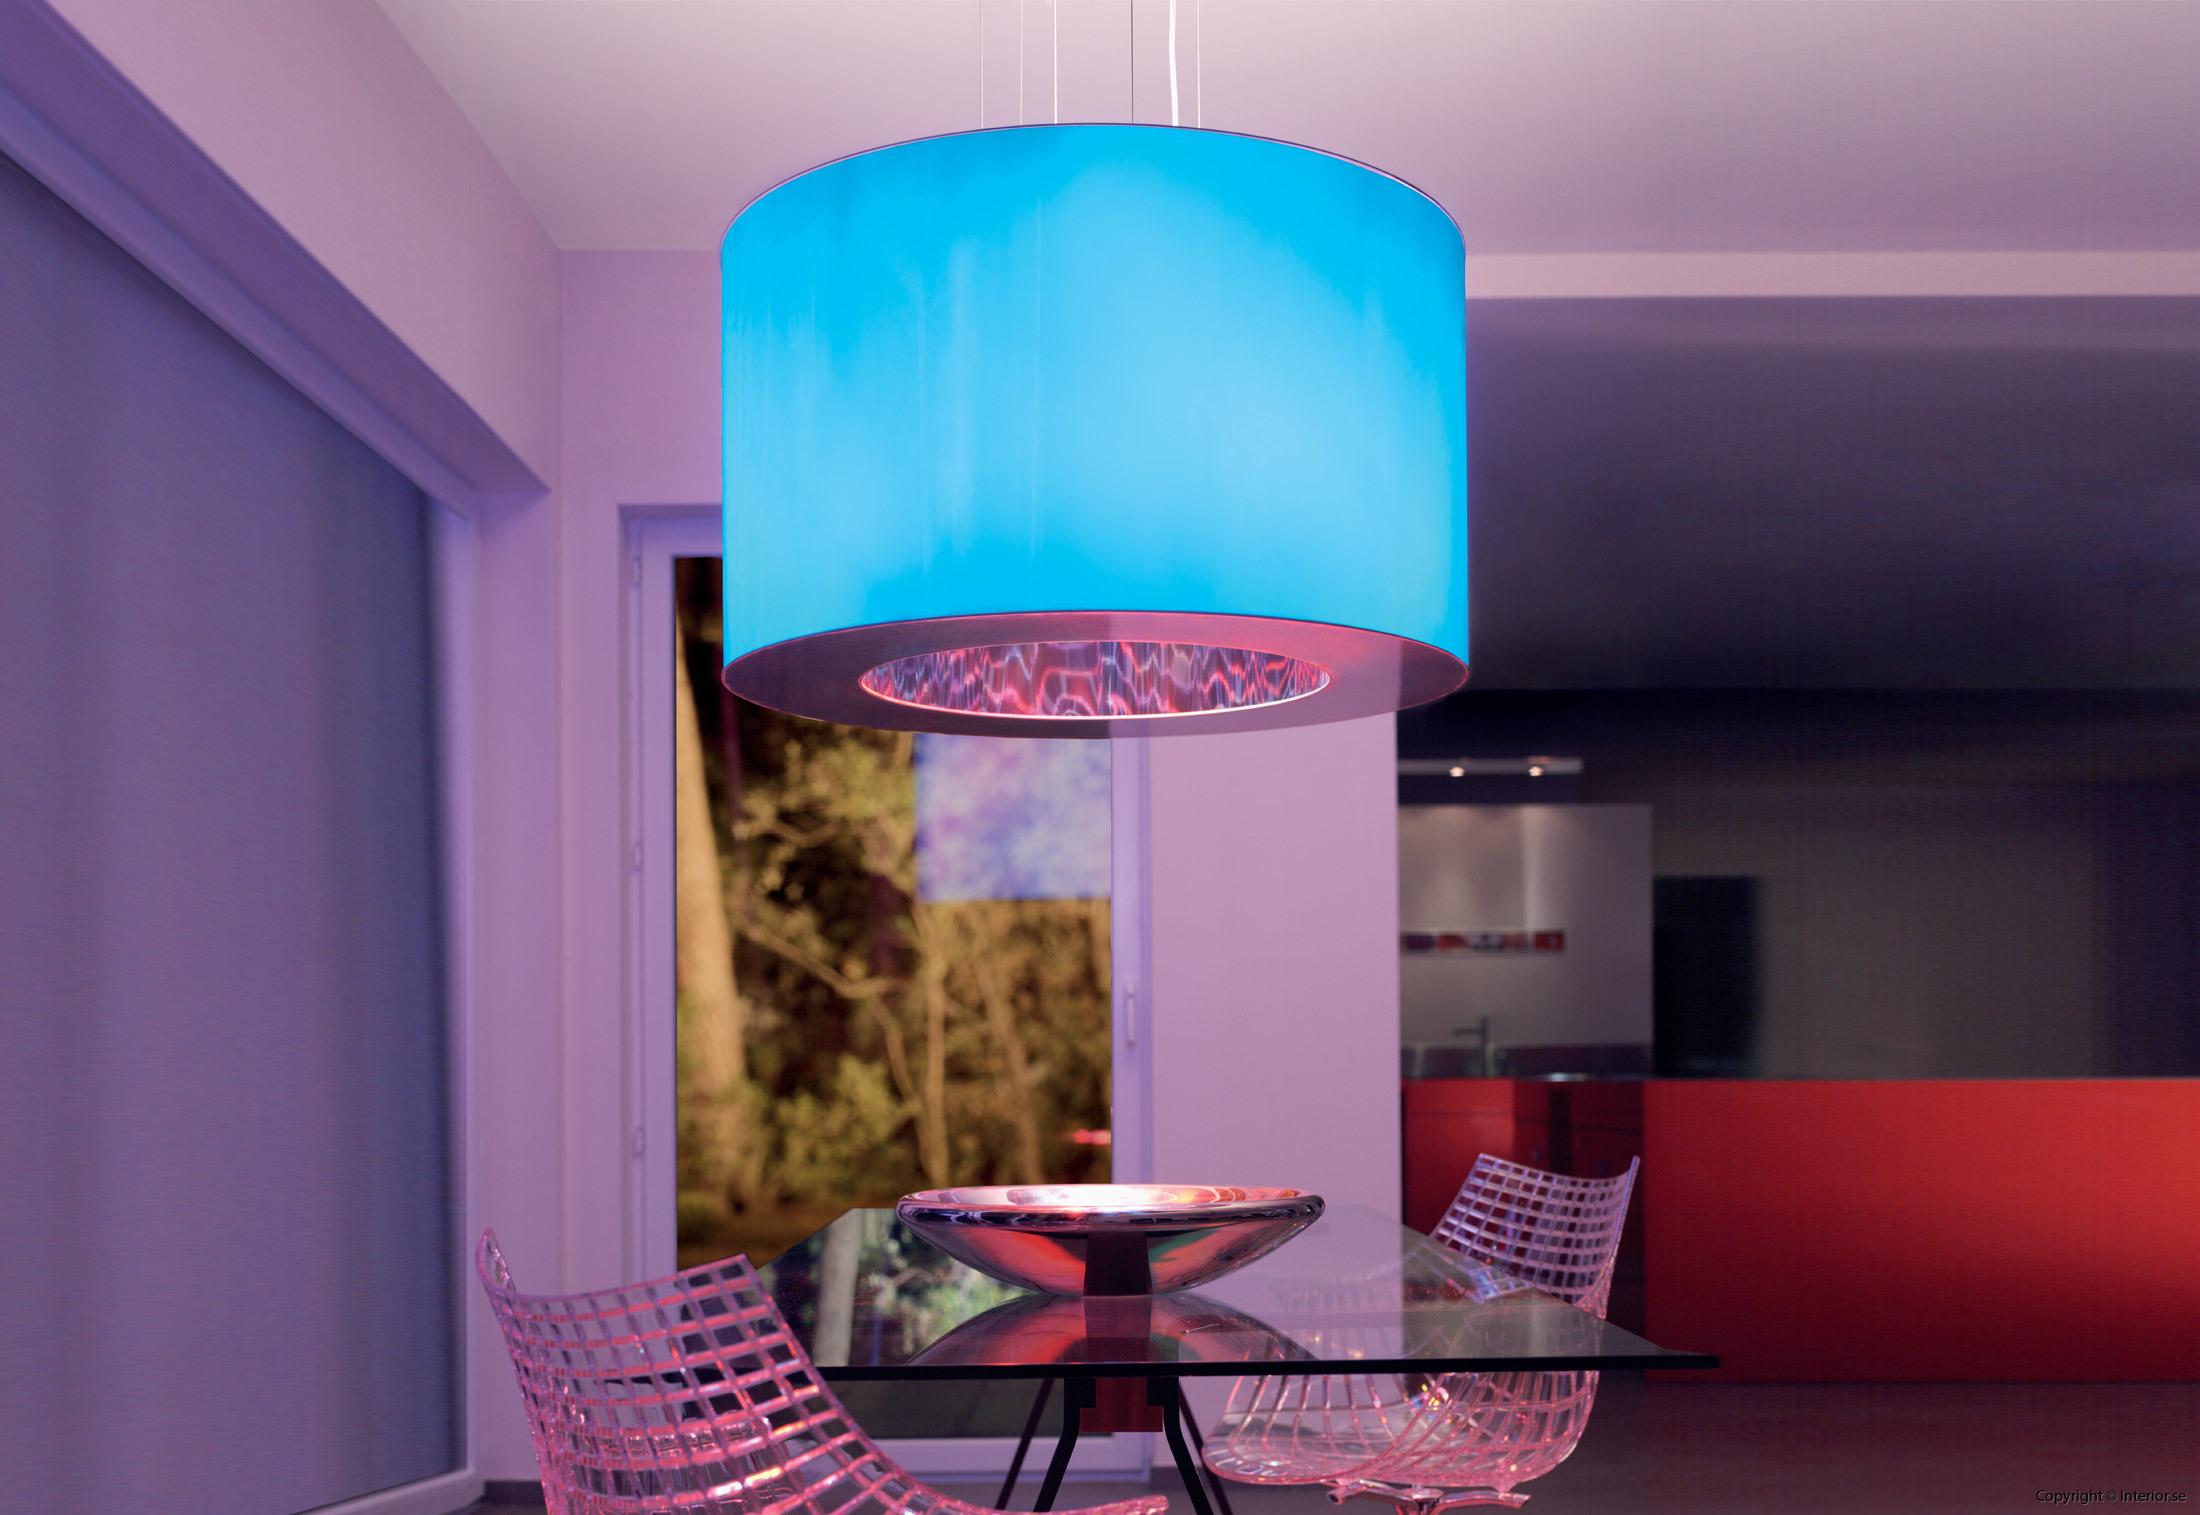 Pendel suspended lamp, Artemide Tian Xia 80 cm - Carlotta de Bevilacqua 2